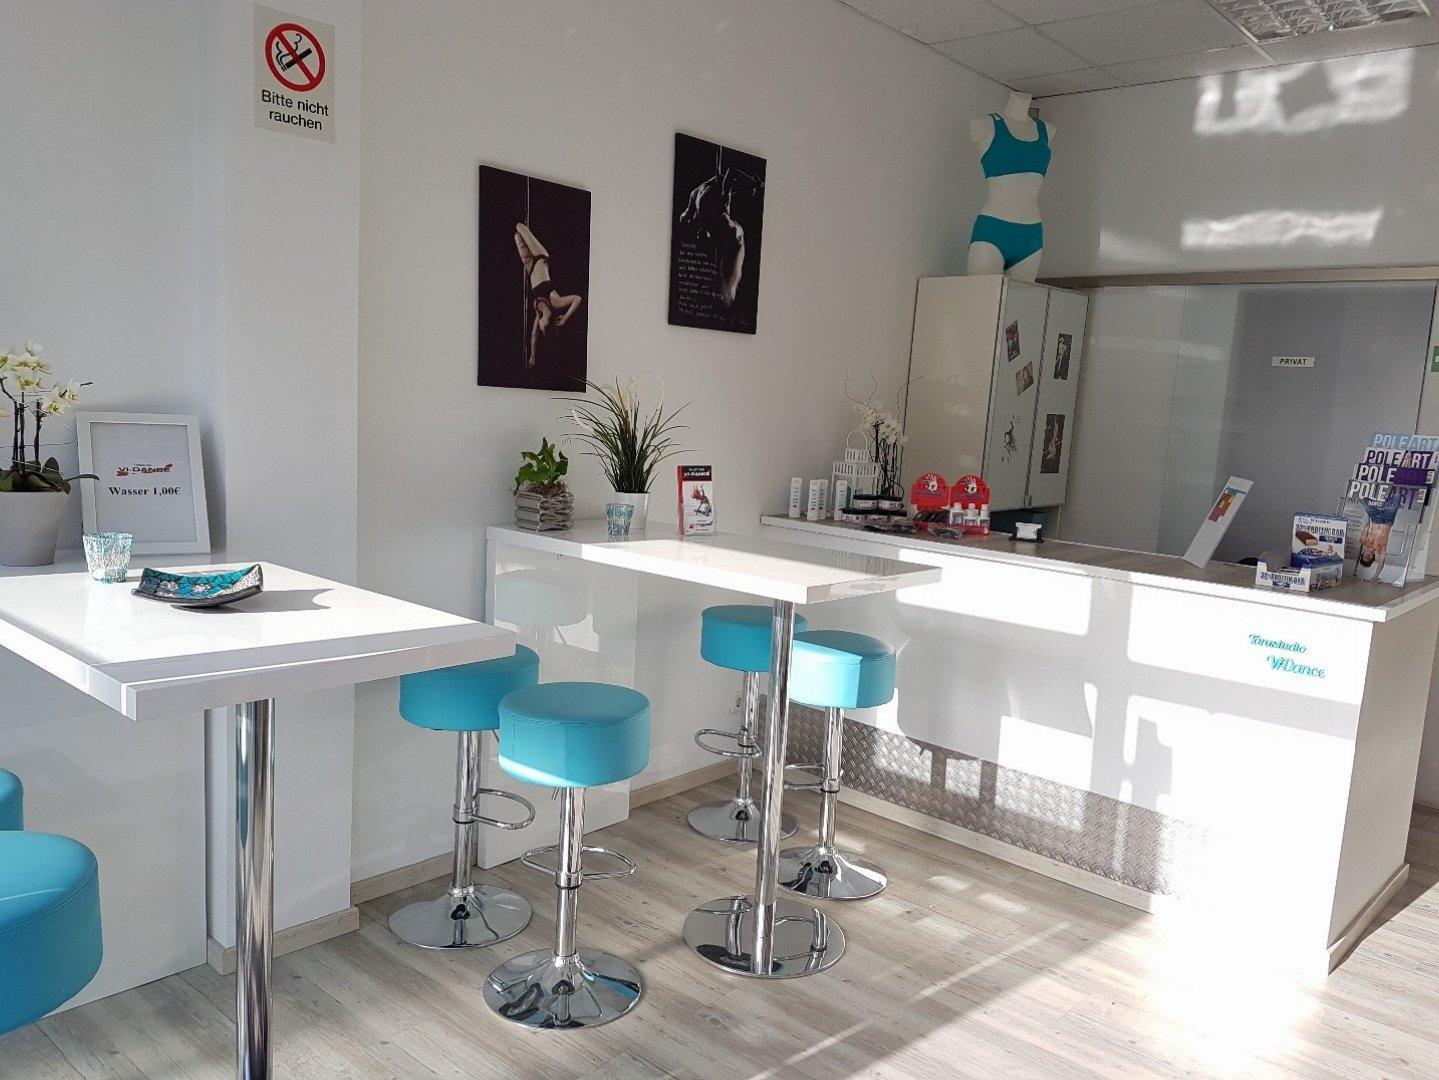 VI-Dance GmbH Studio Hamm in 59077 Hamm